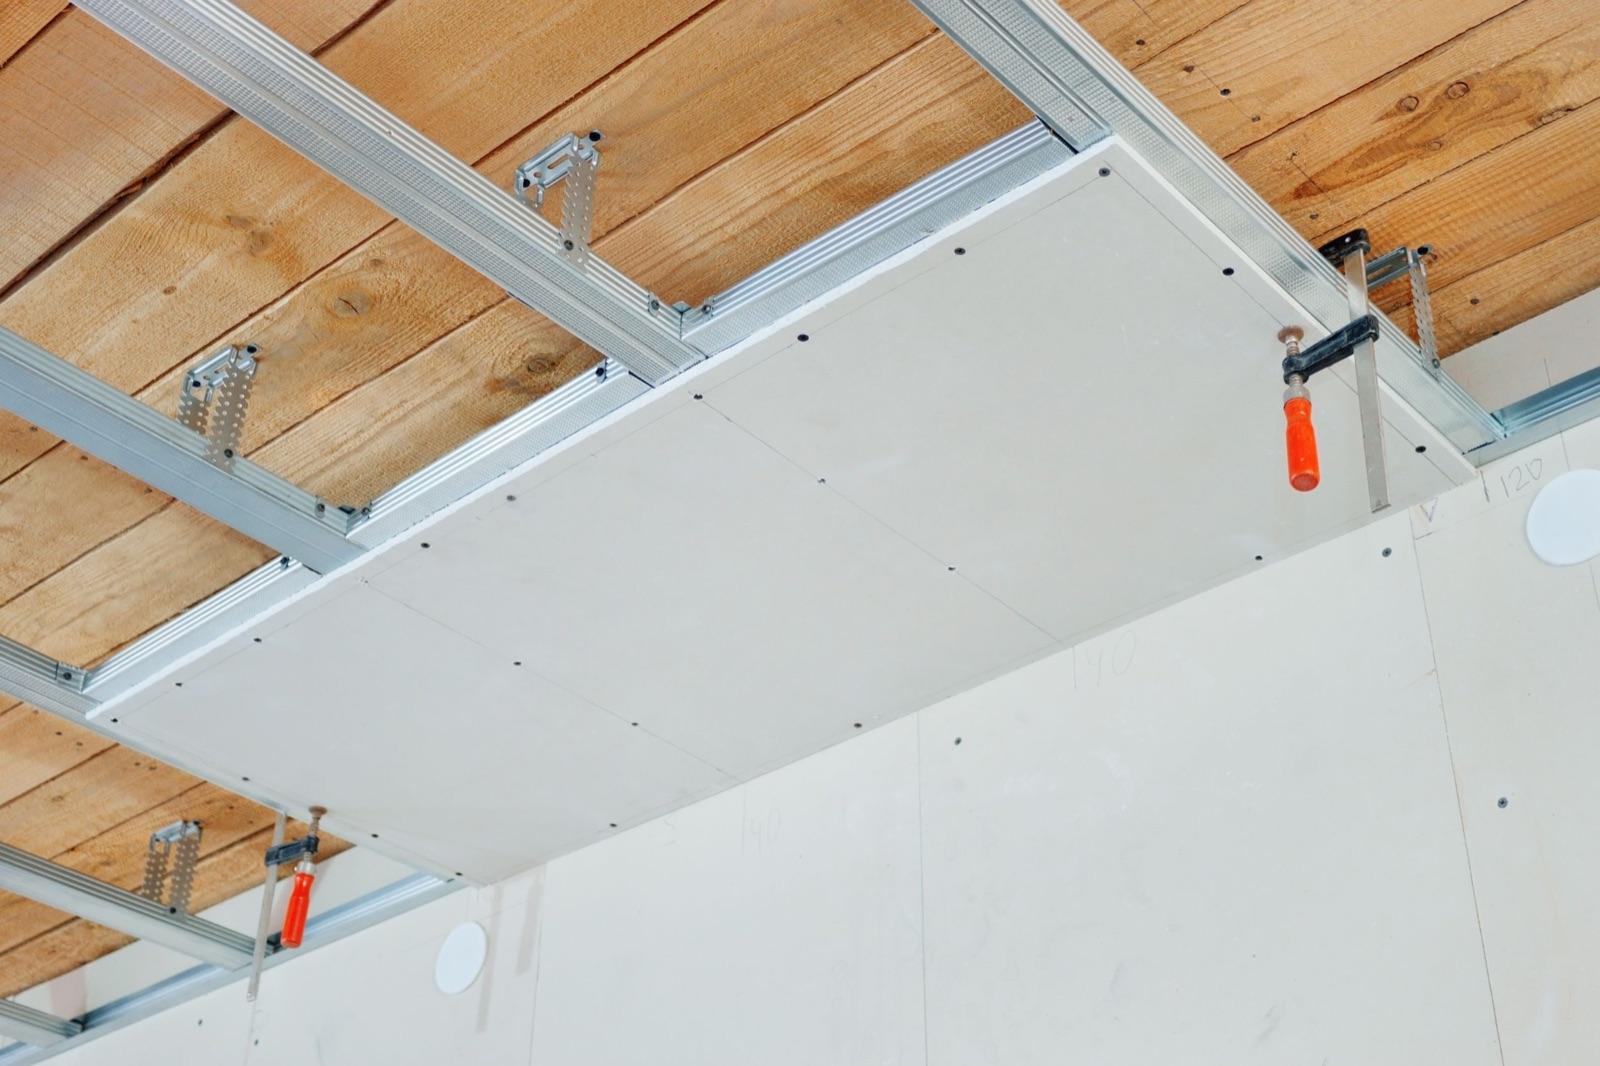 Spuščen strop: knauf strop ali armstrong strop?